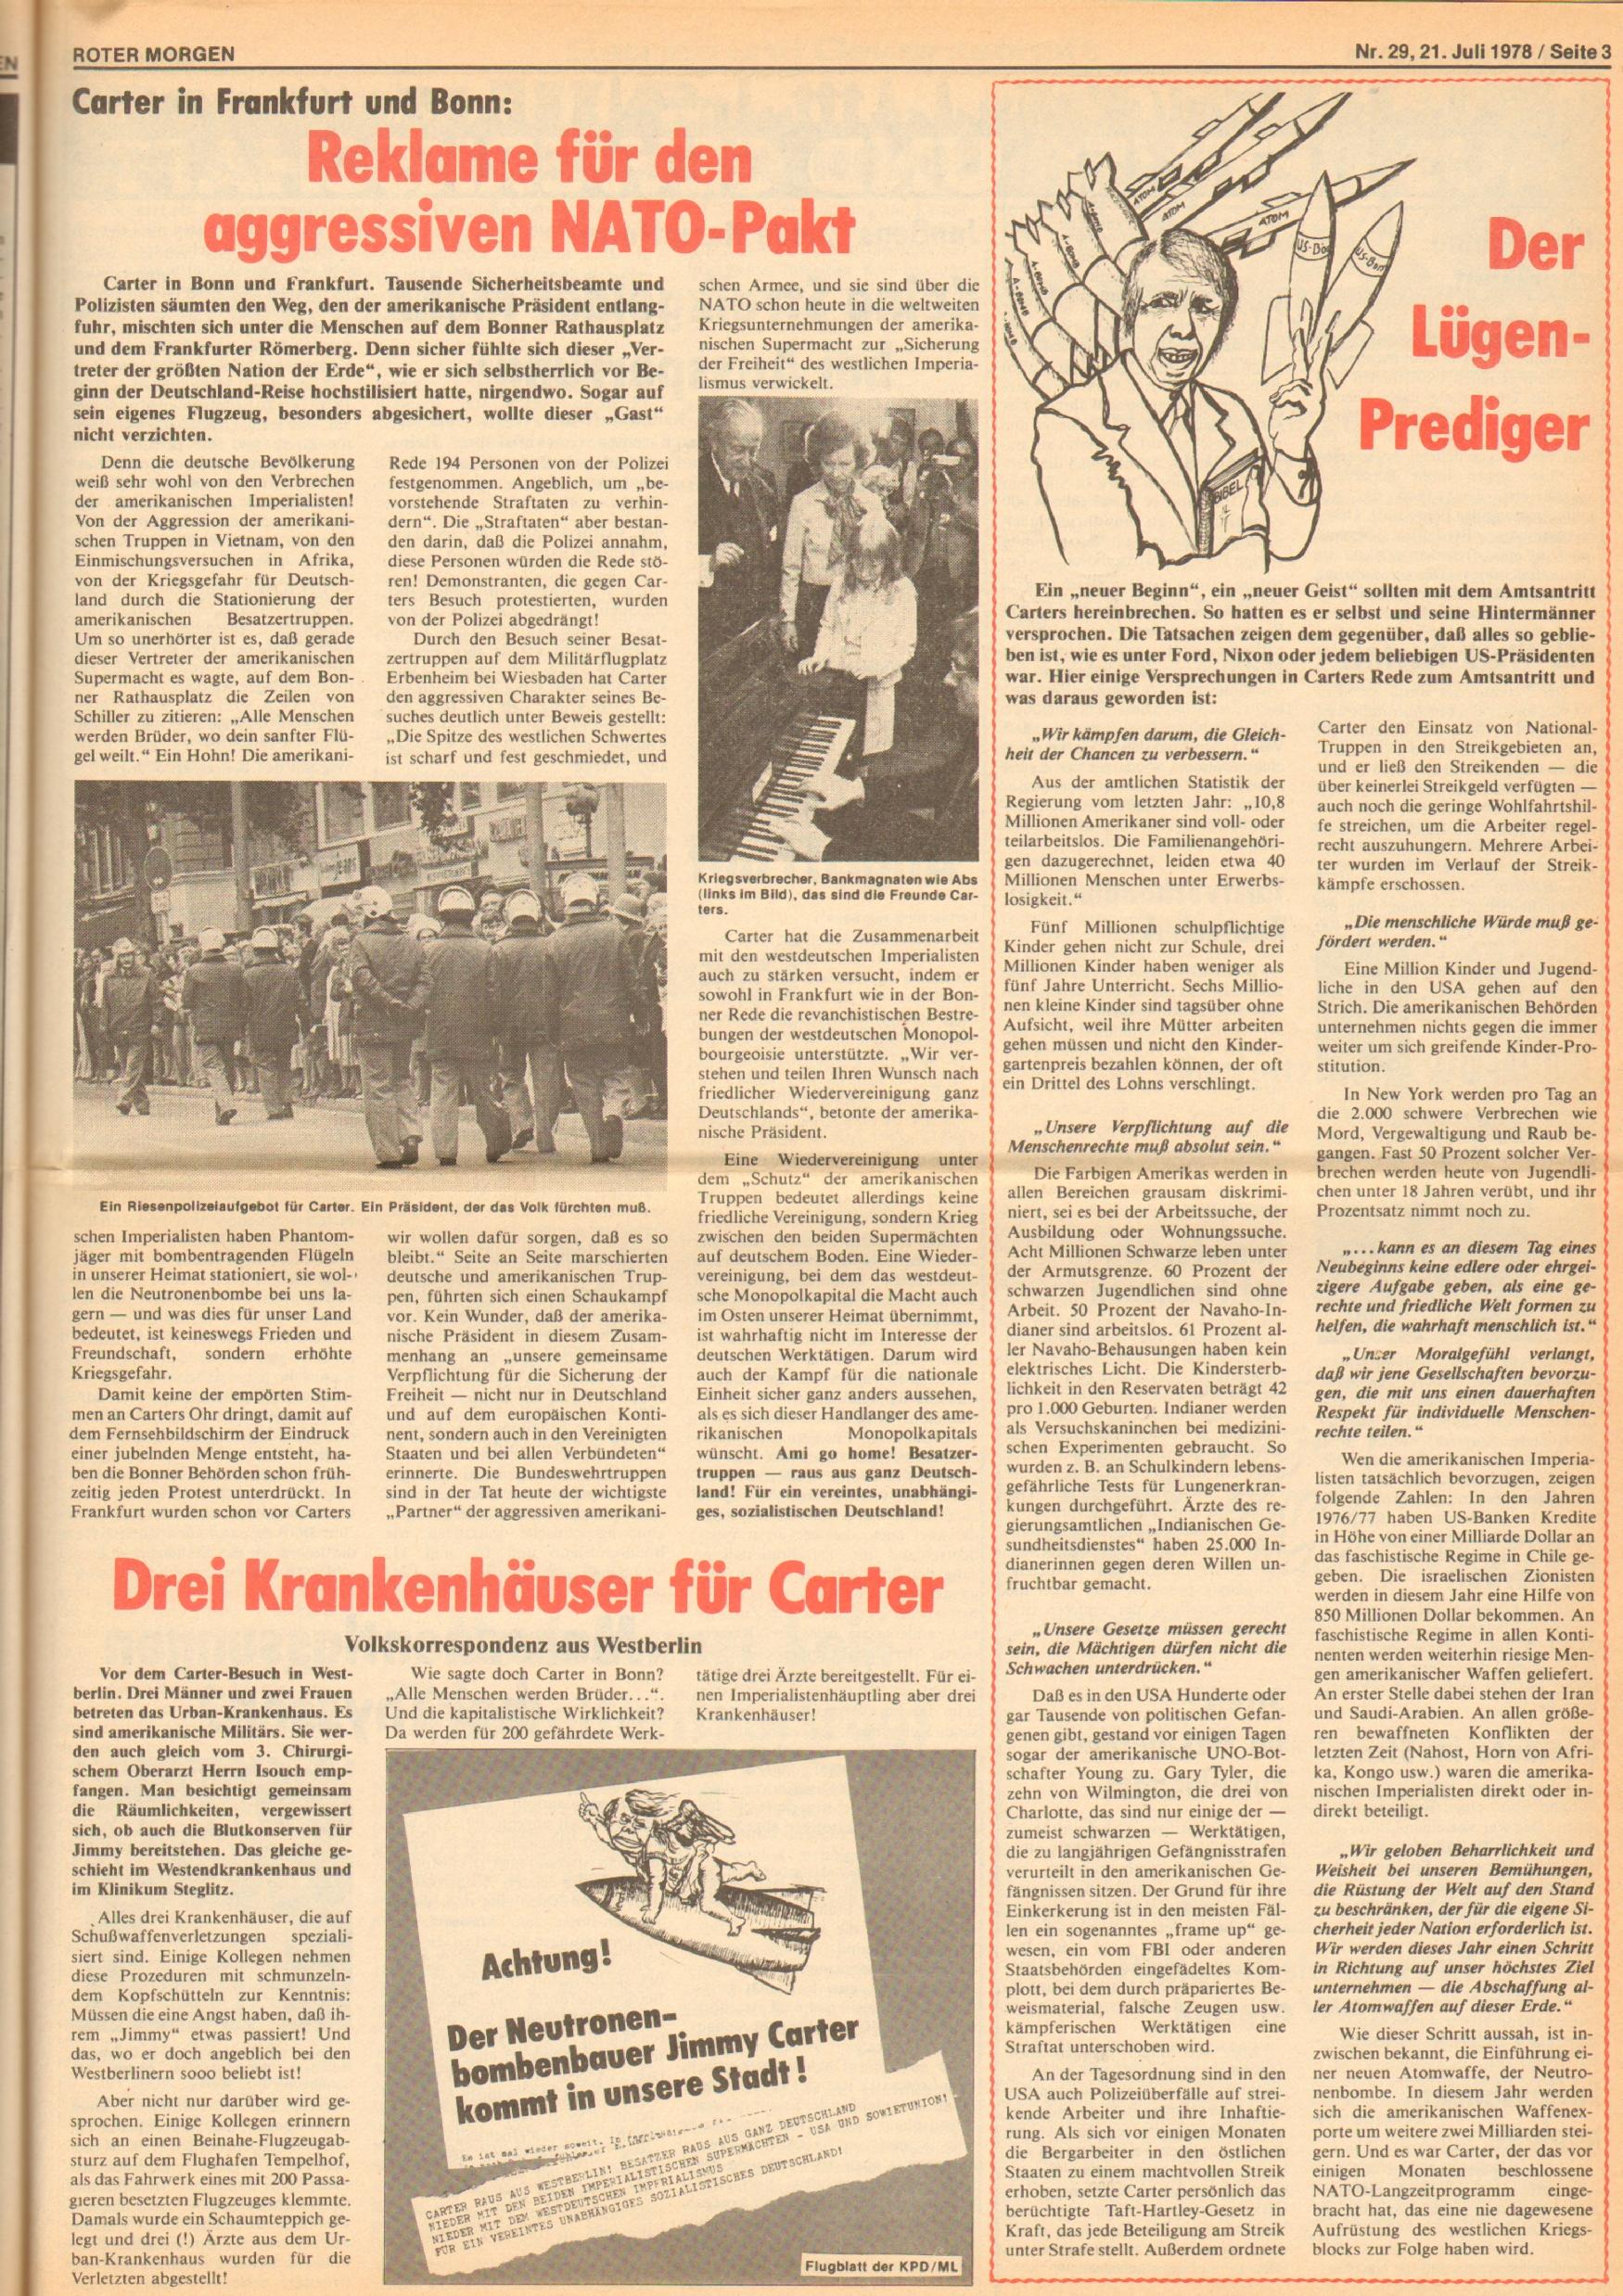 Roter Morgen, 12. Jg., 21. Juli 1978, Nr. 29, Seite 3